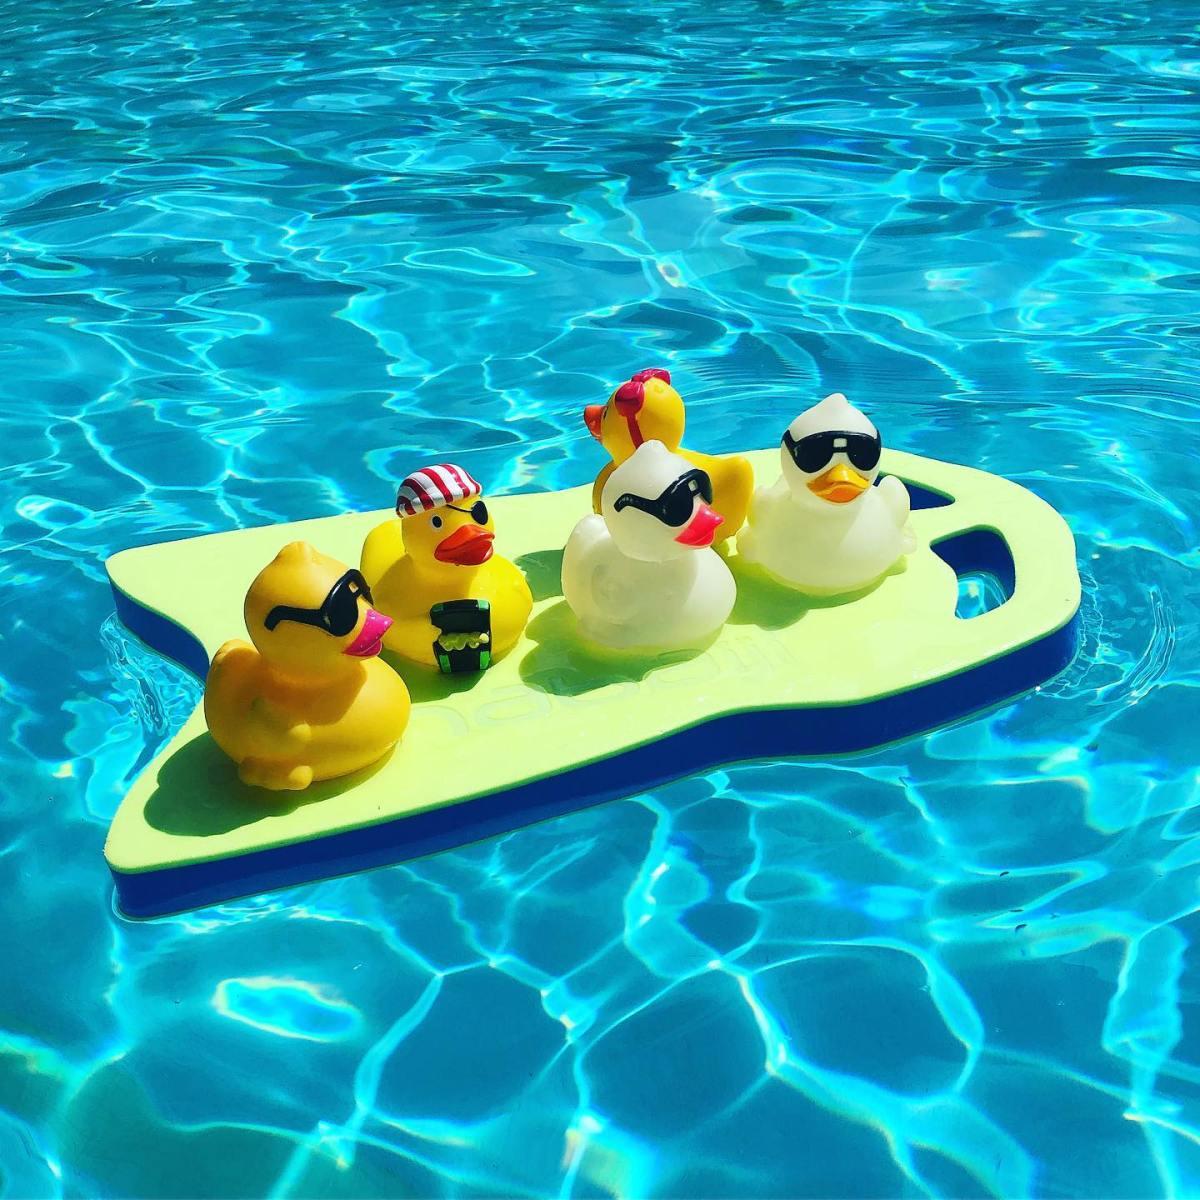 Water play ducks